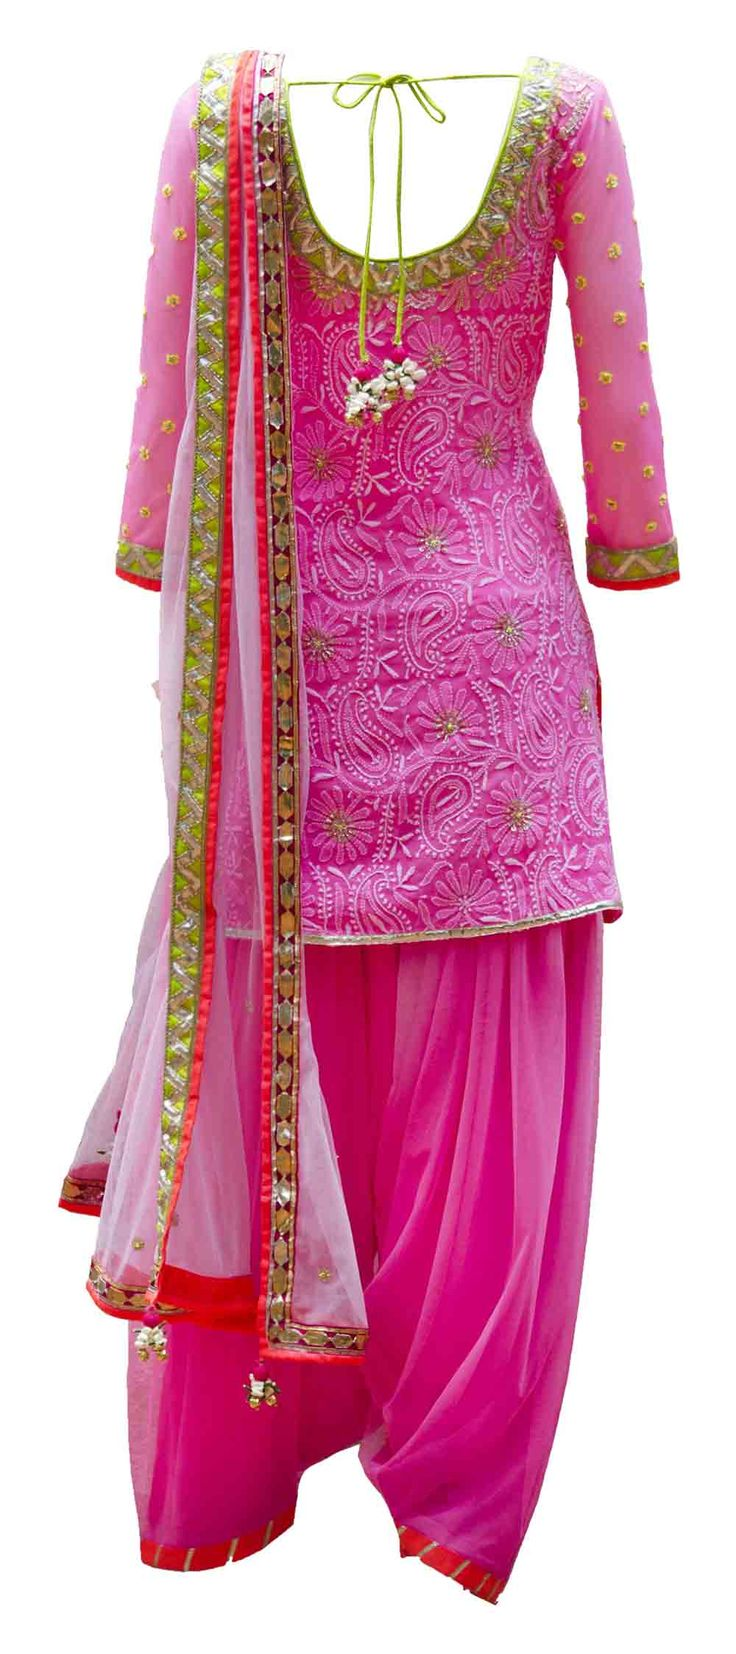 Latest Indian Patiala shalwar kameez fashion 2015-2016 (4)